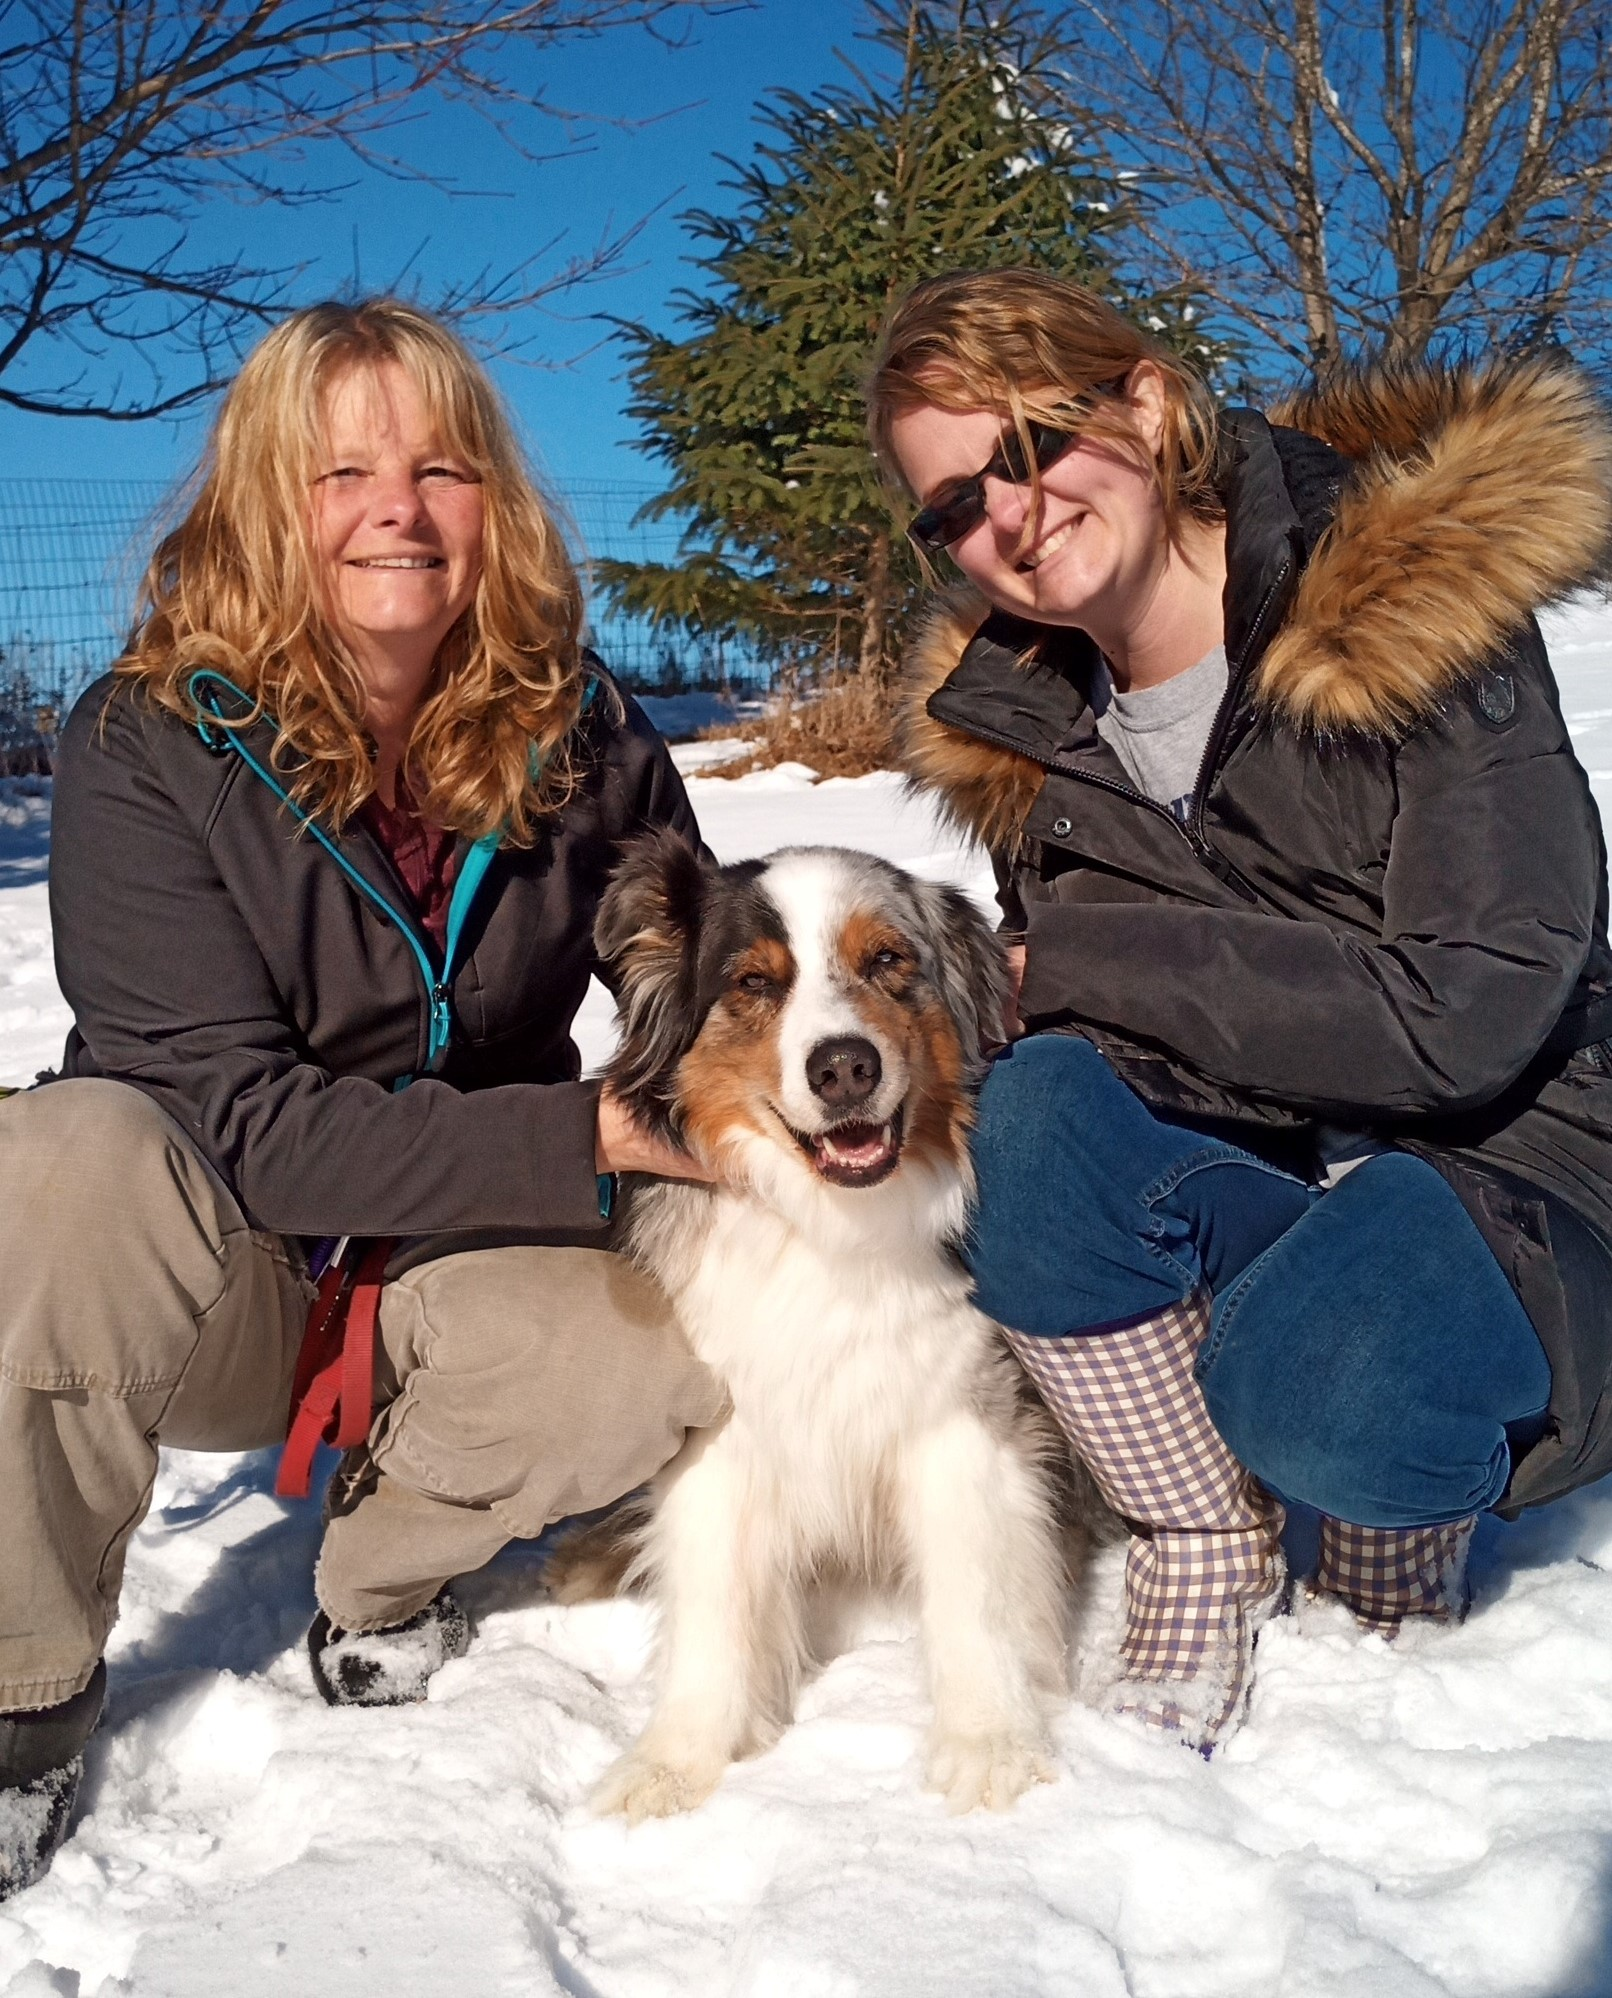 Dog Walker/ Dog Experts/for the love of Dogs/ winter dog walking